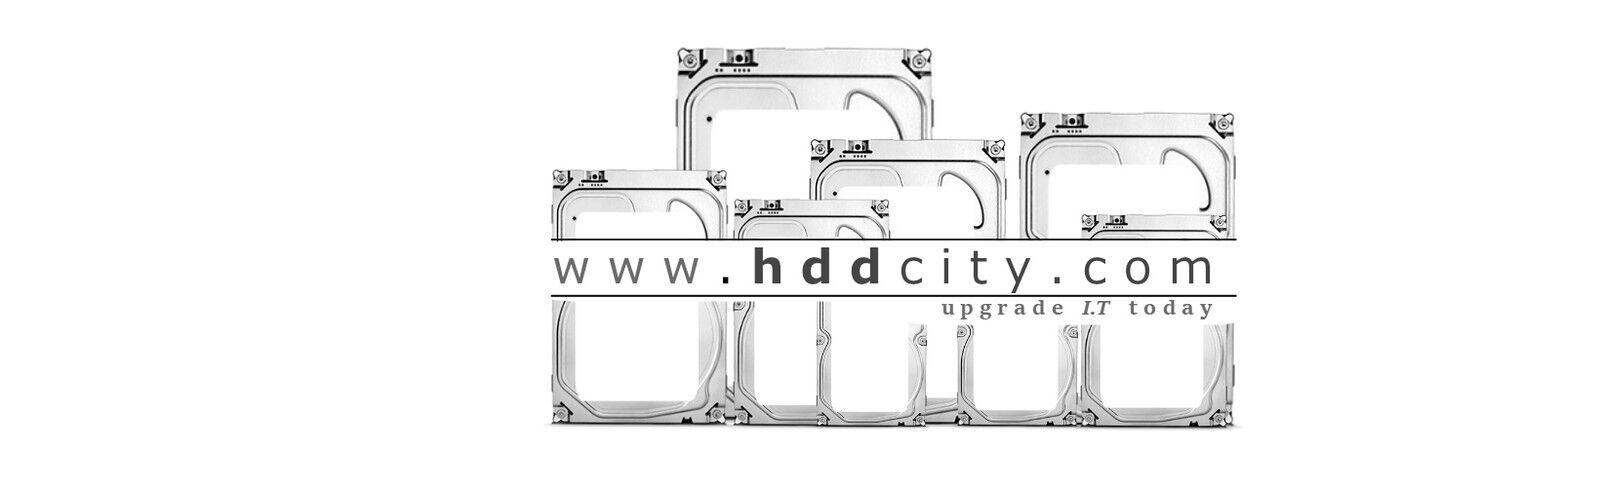 HDDcity.com